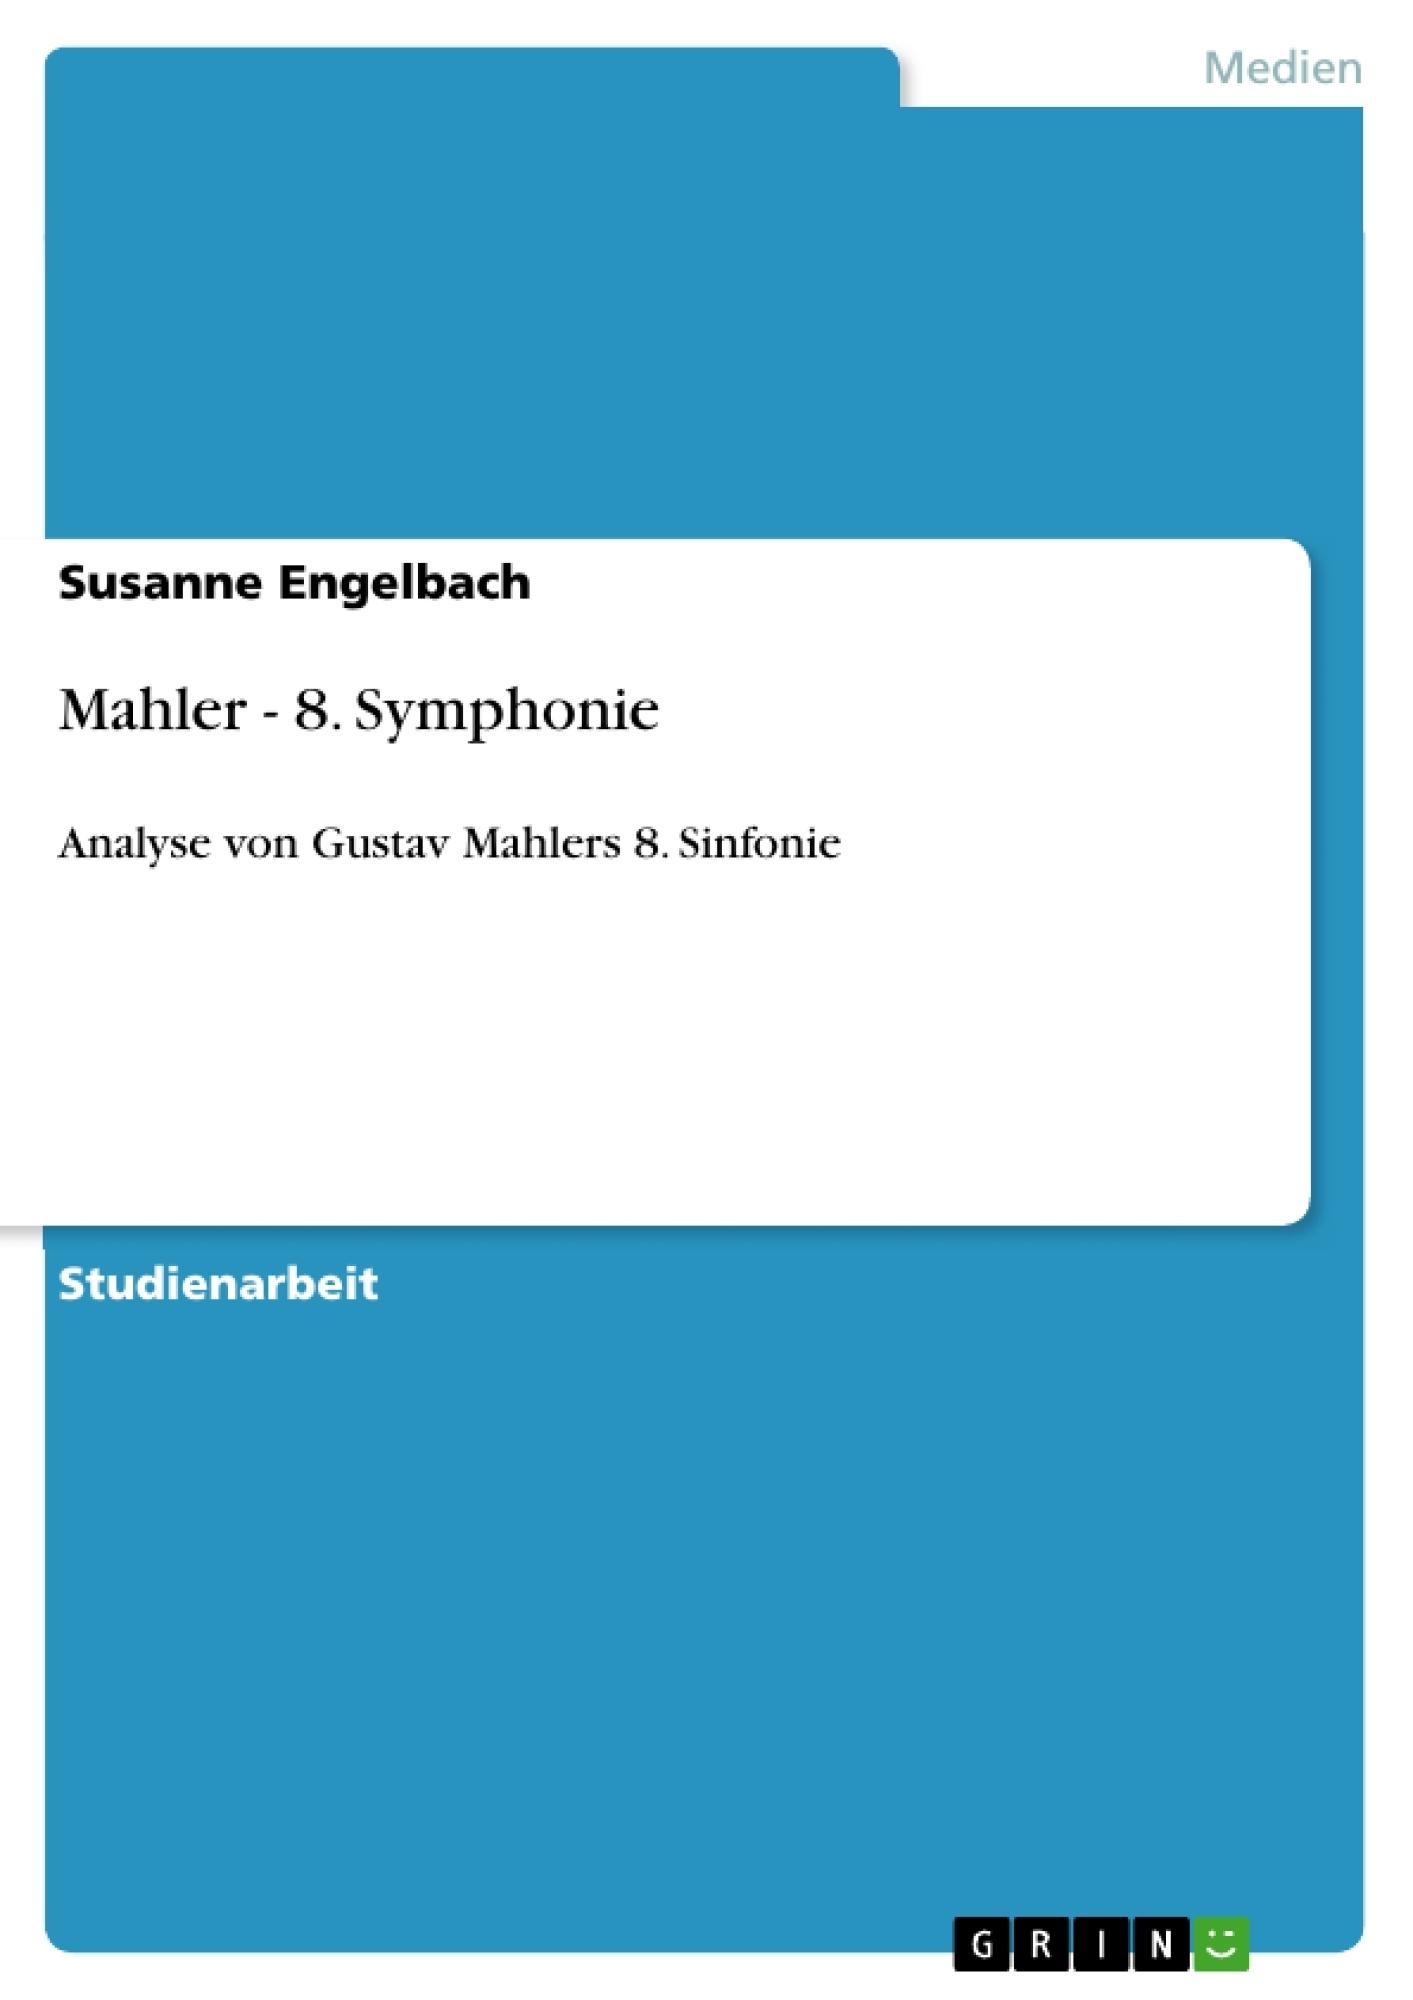 Titel: Mahler - 8. Symphonie